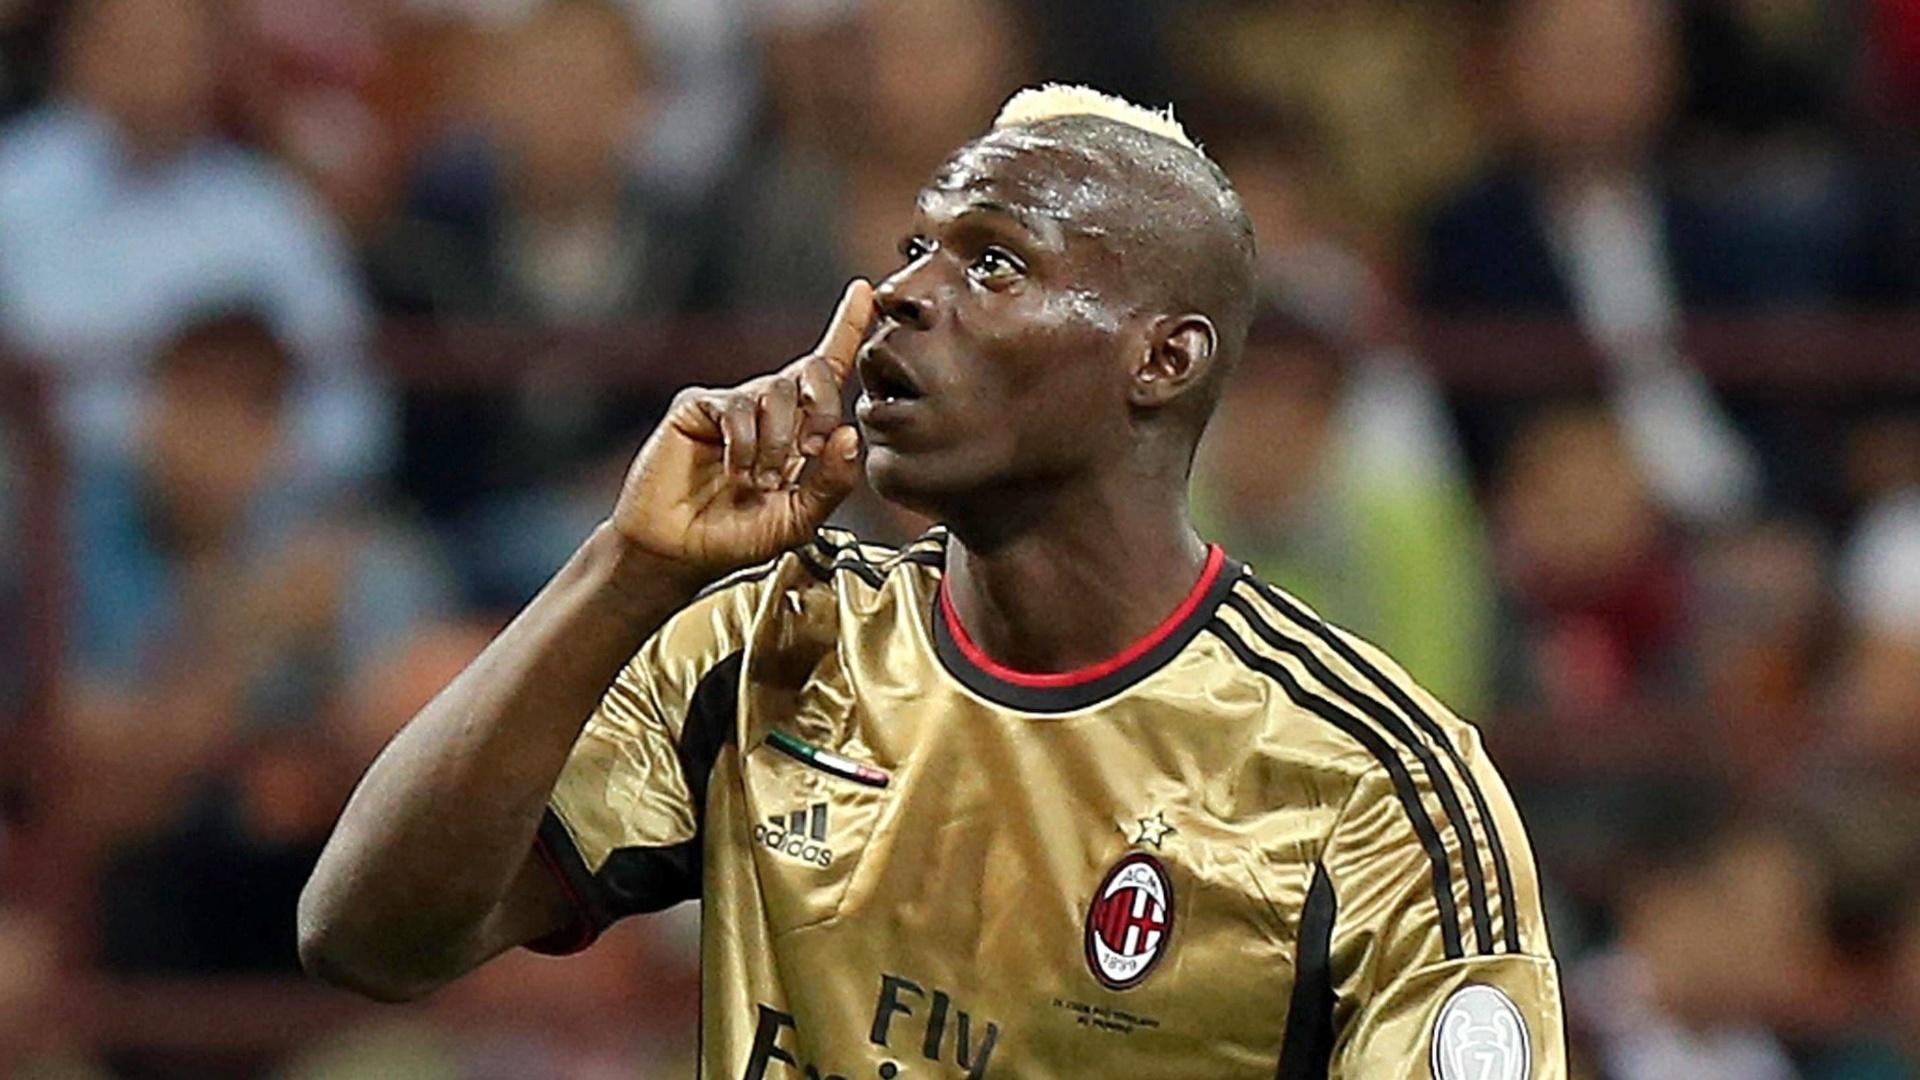 12.mai.2013 - No jogo entre Milan e Roma, Mario Balotelli manda torcida romana se calar após manifestações racistas contra jogadores negros